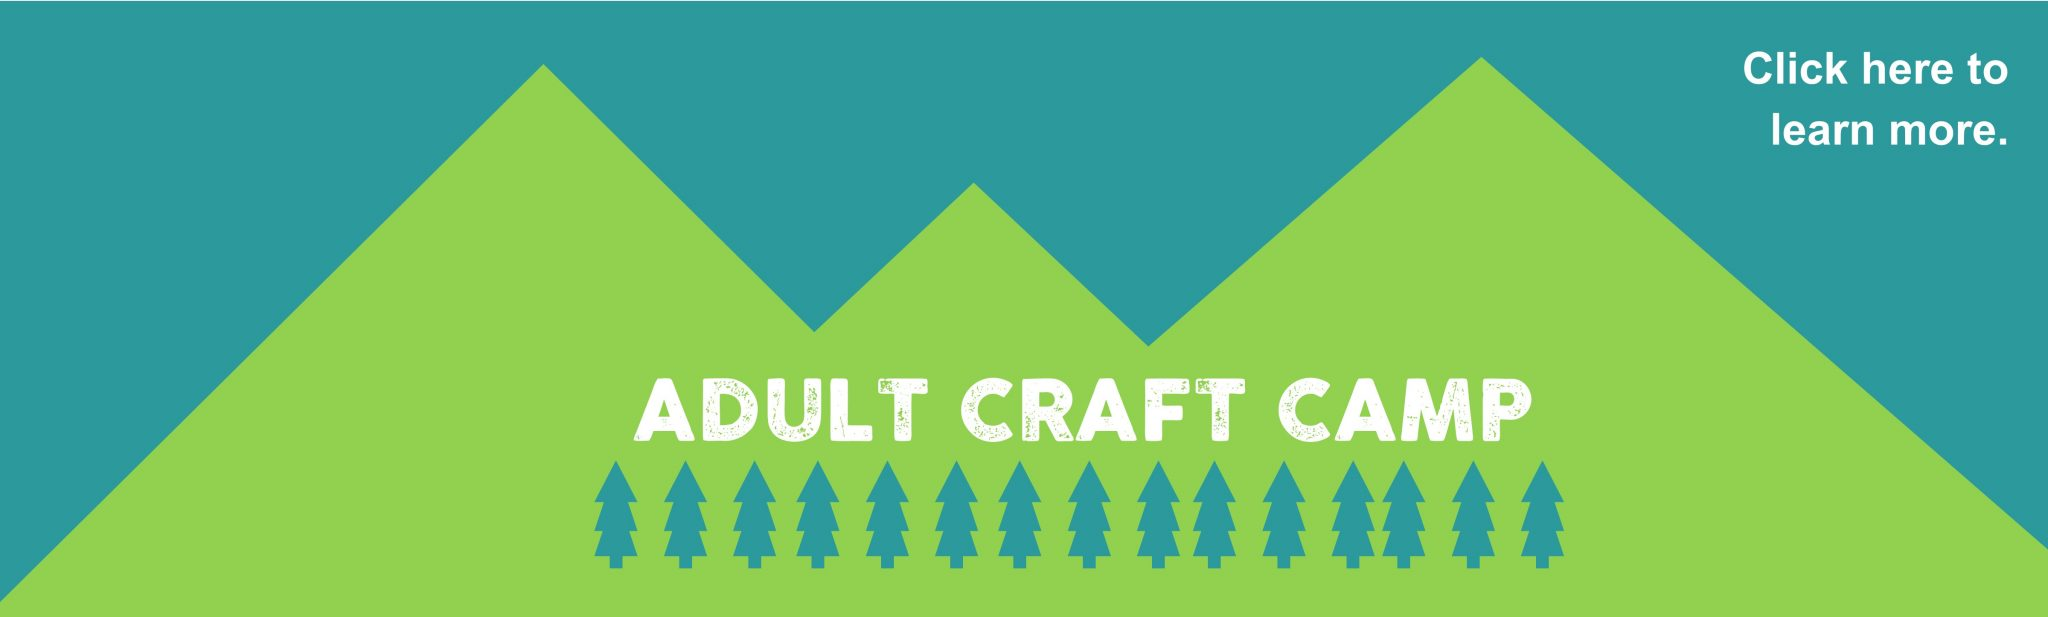 adult craft camp 2017